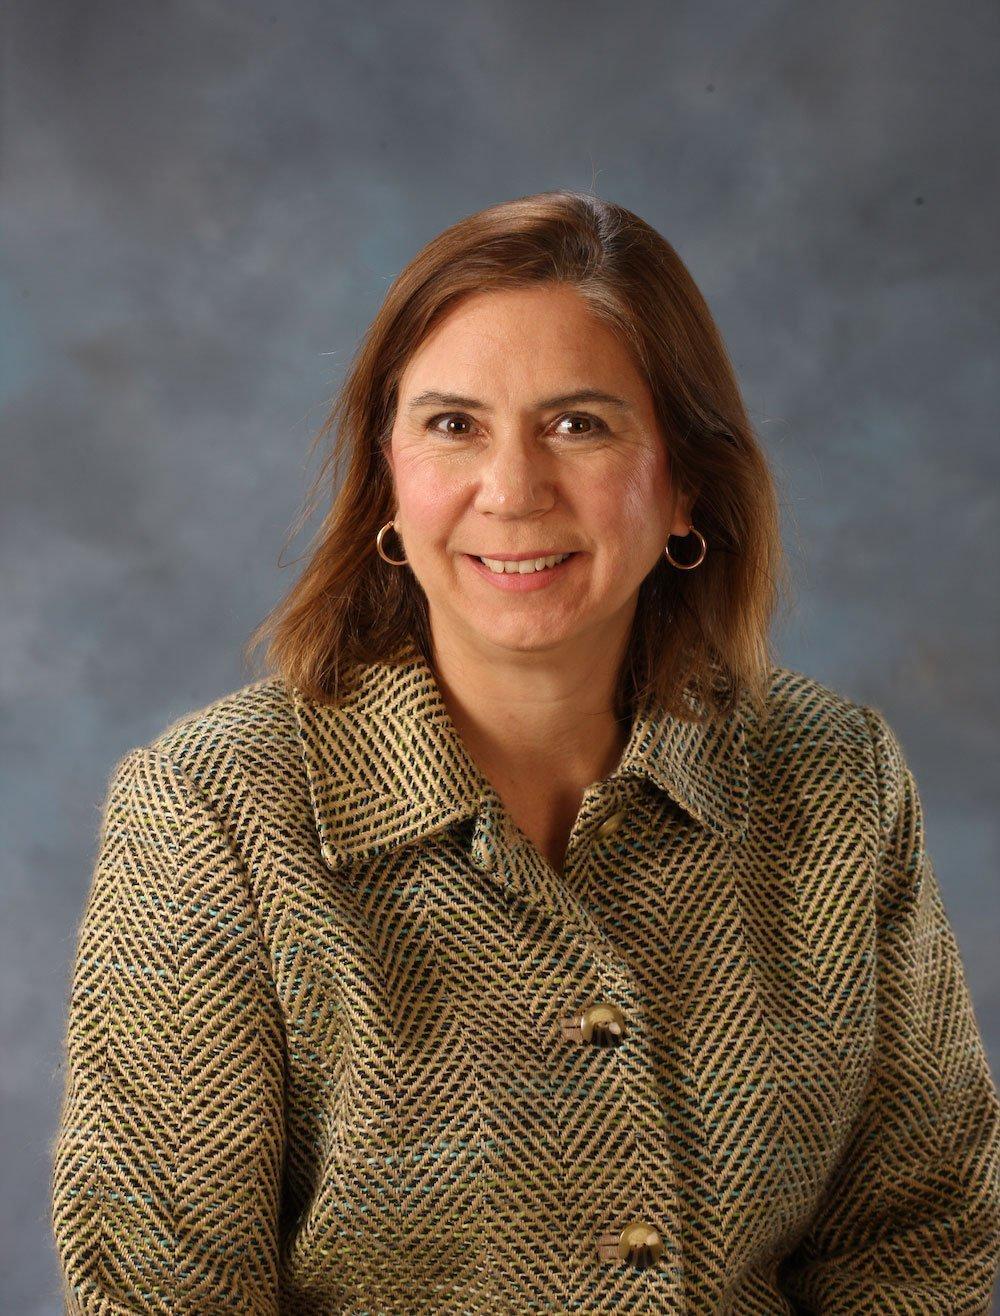 Angela Dowson Pompian